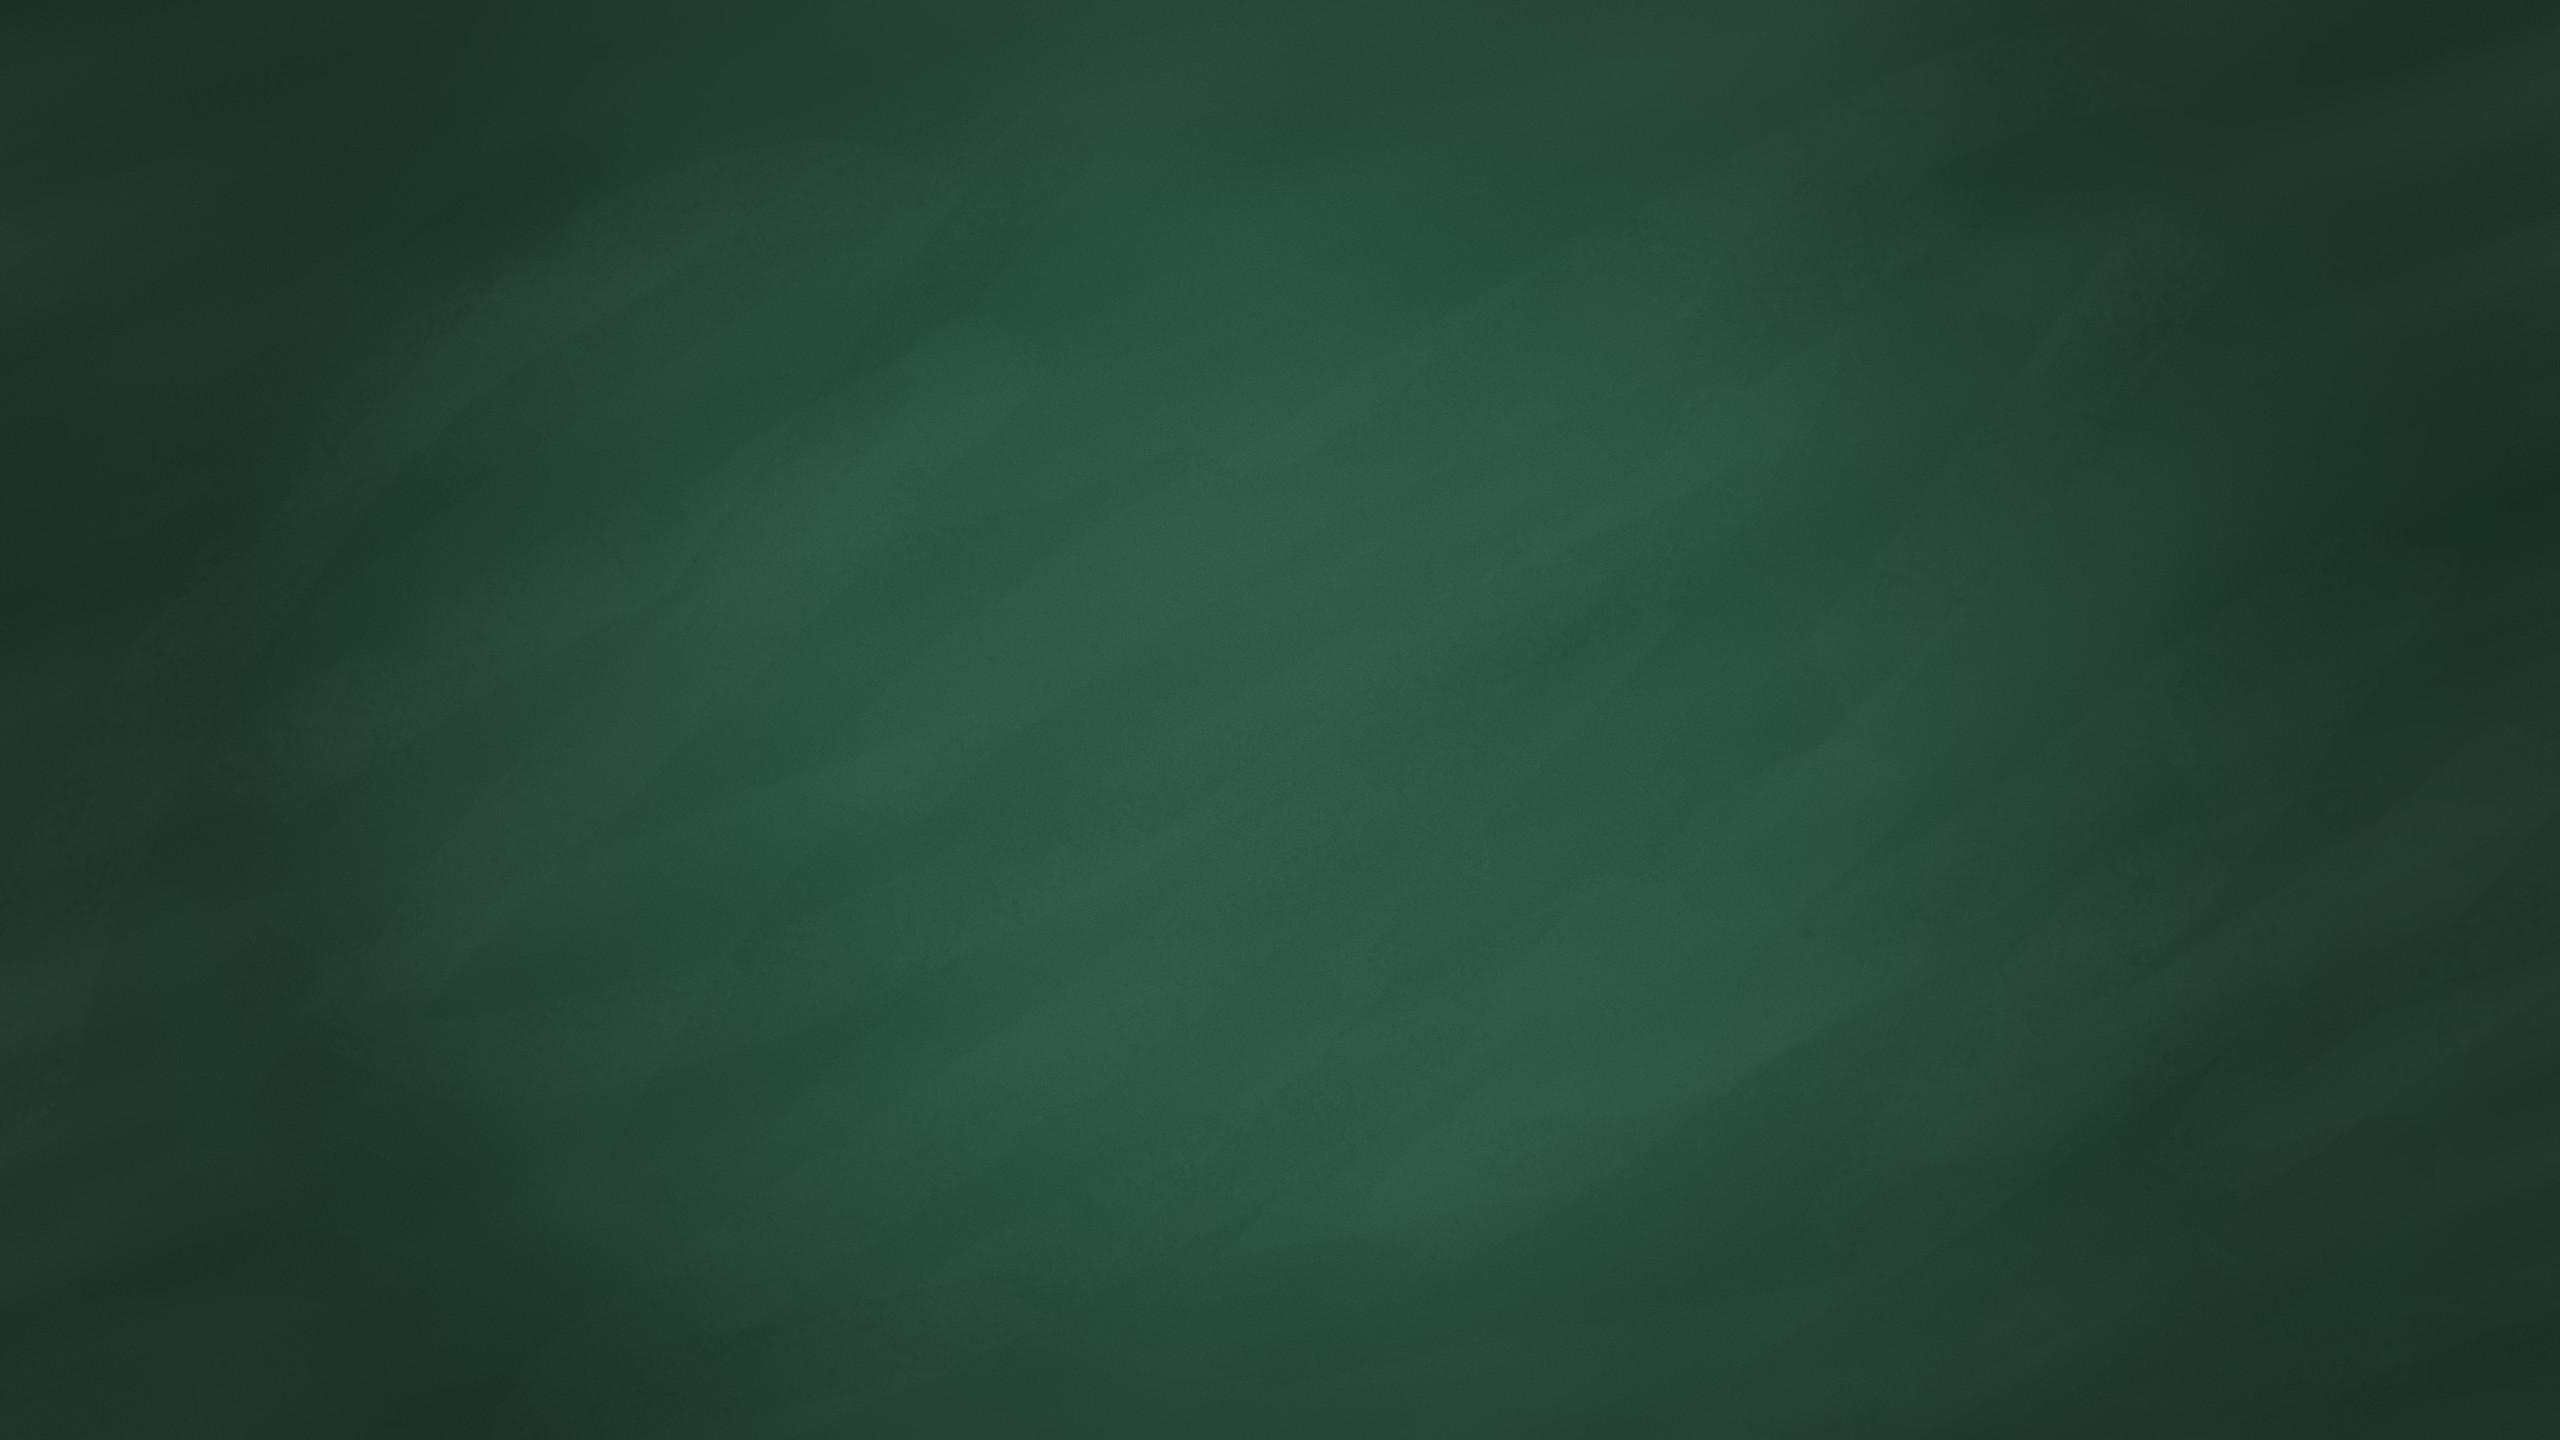 Chalkboard Wallpaper – WallpaperSafari